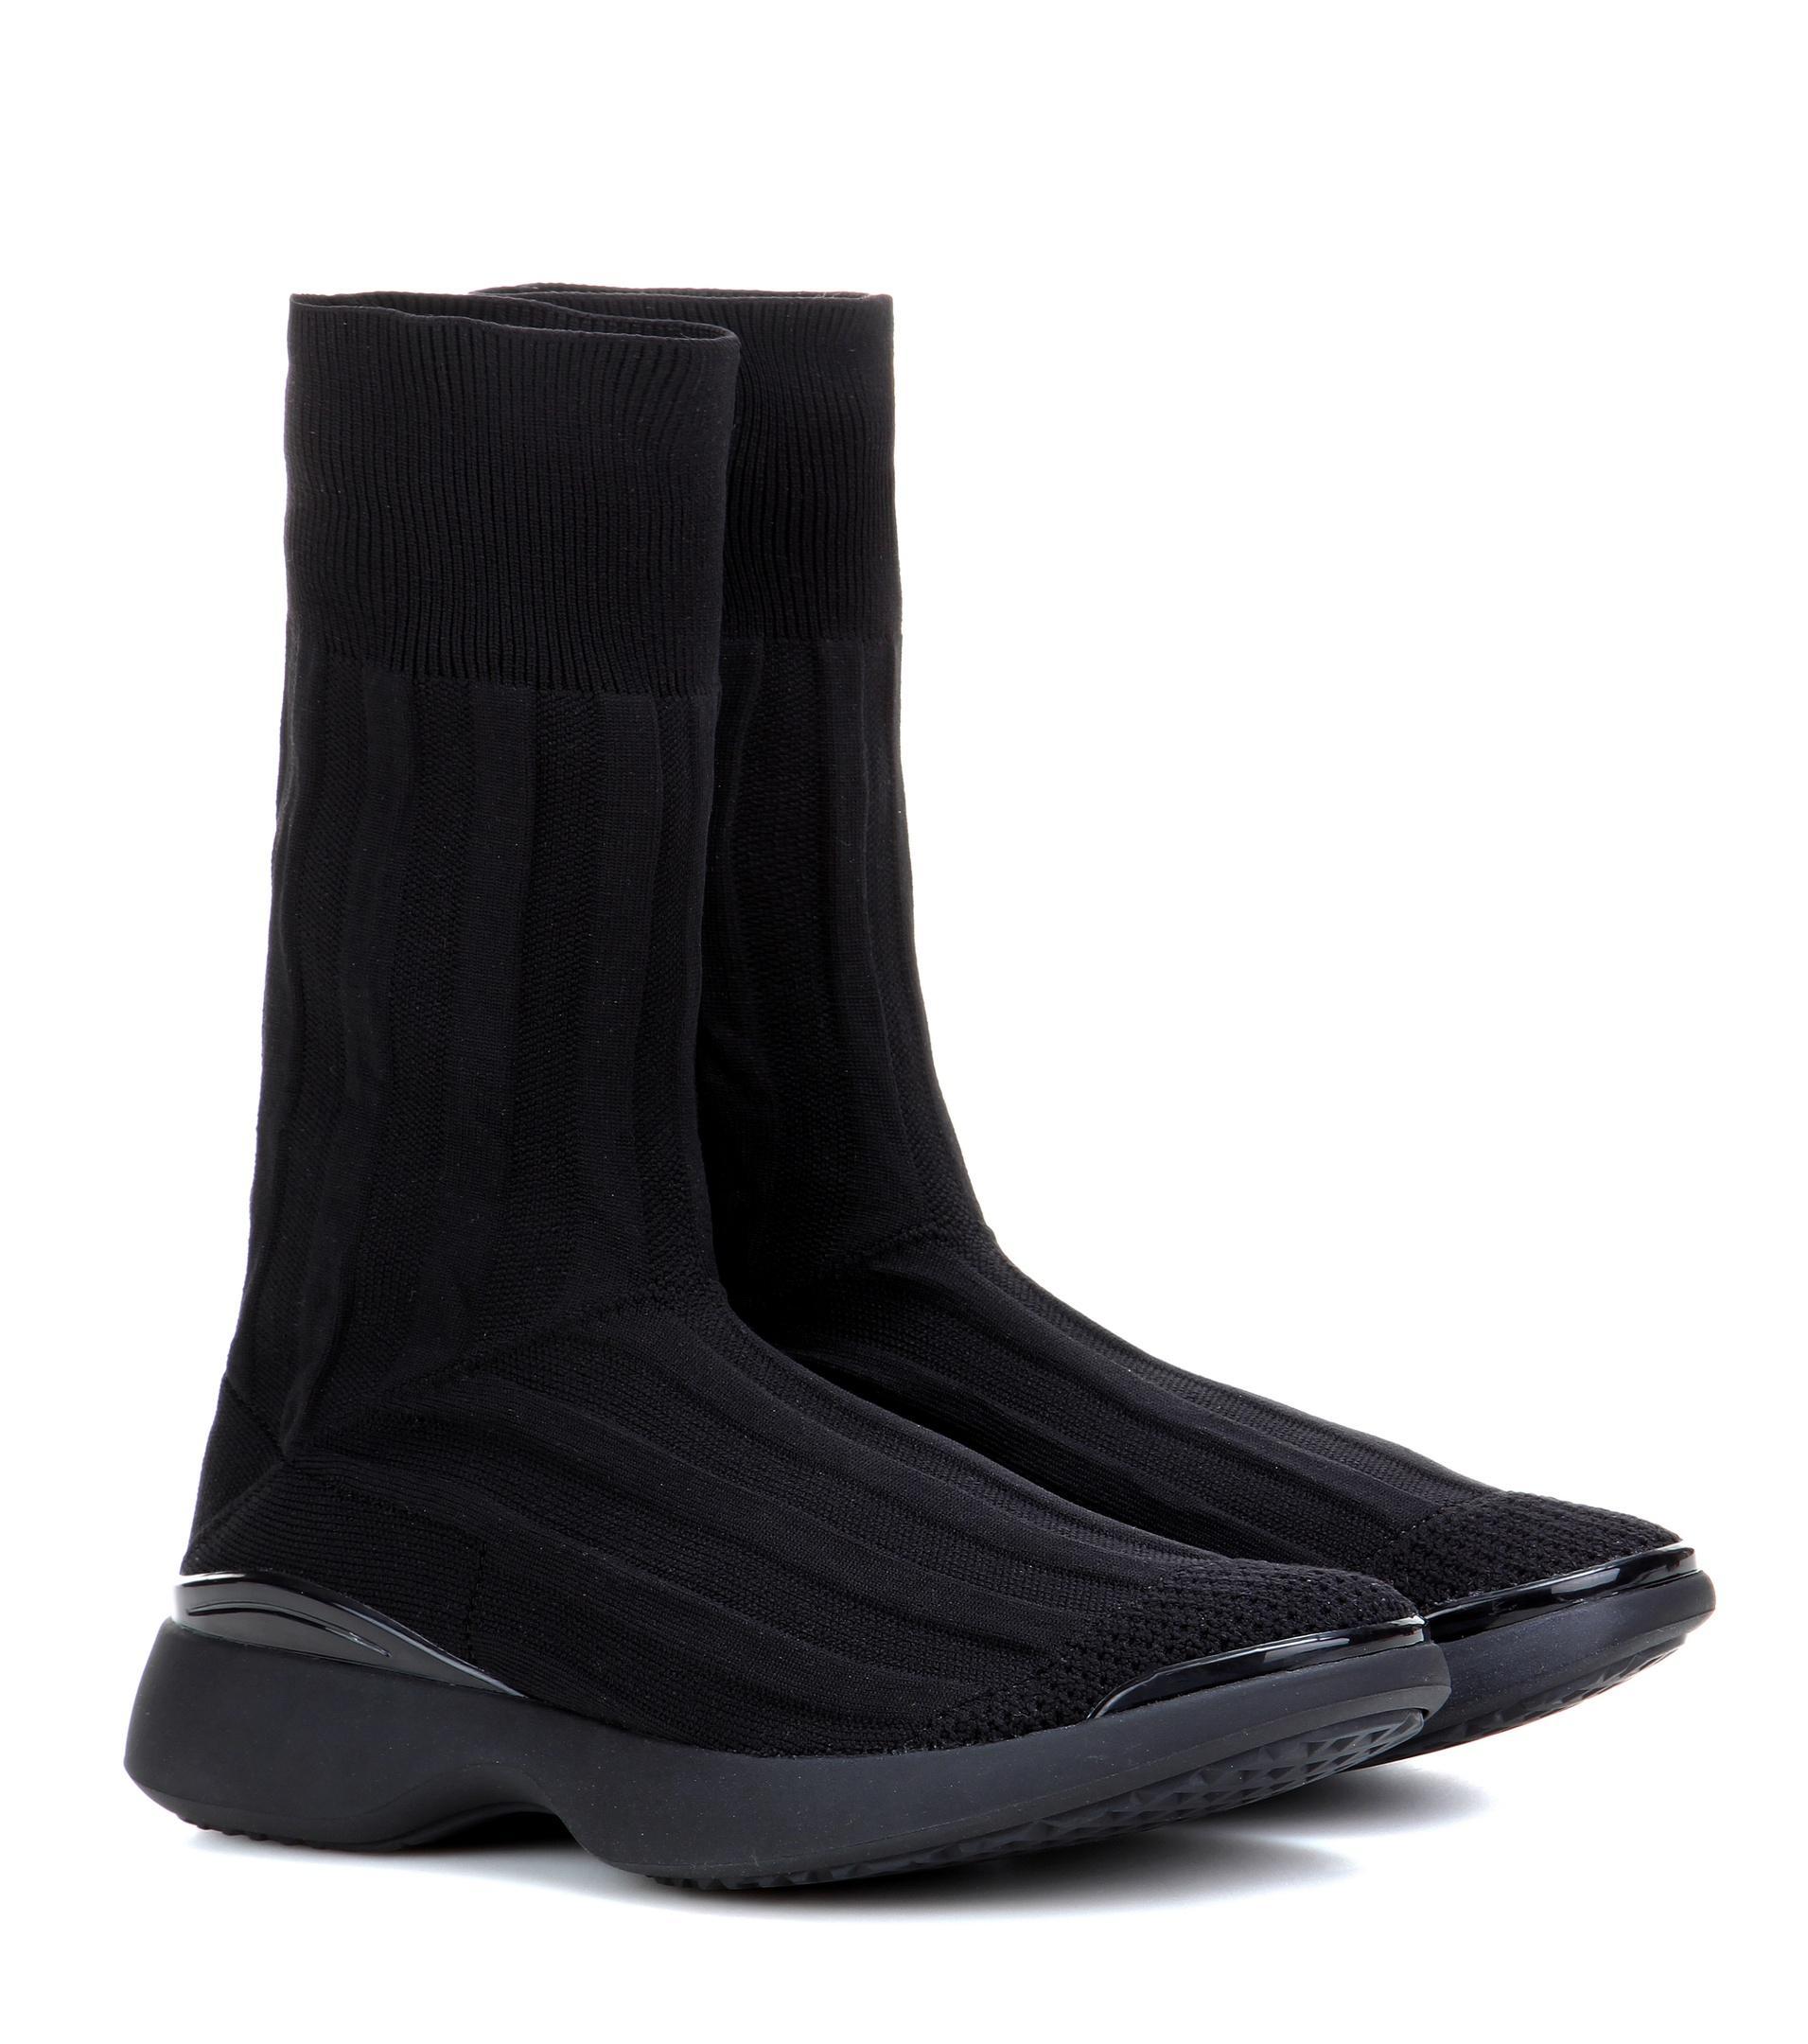 Acne Studios Batilda Sock Sneakers in